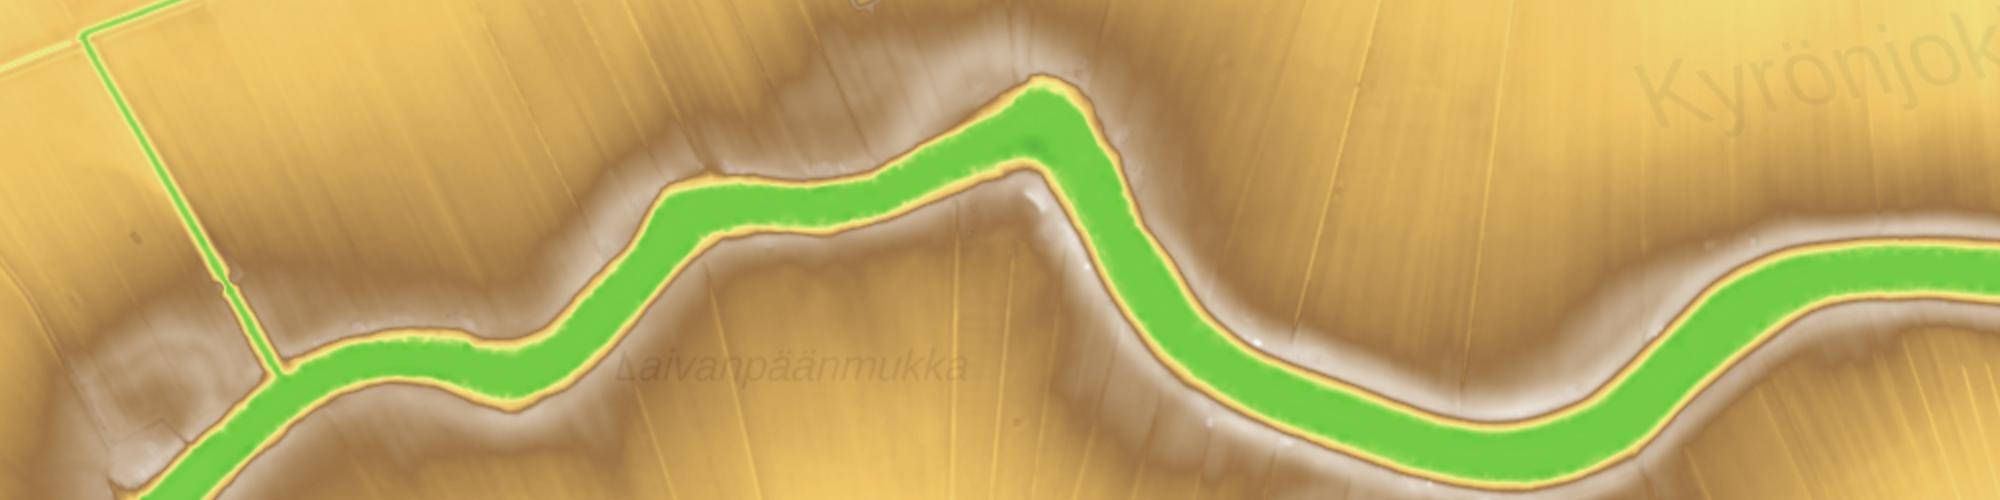 Exaggerated 2 m DEM in flat Ostrobothnia, GeoPortti by Lassi Lehto